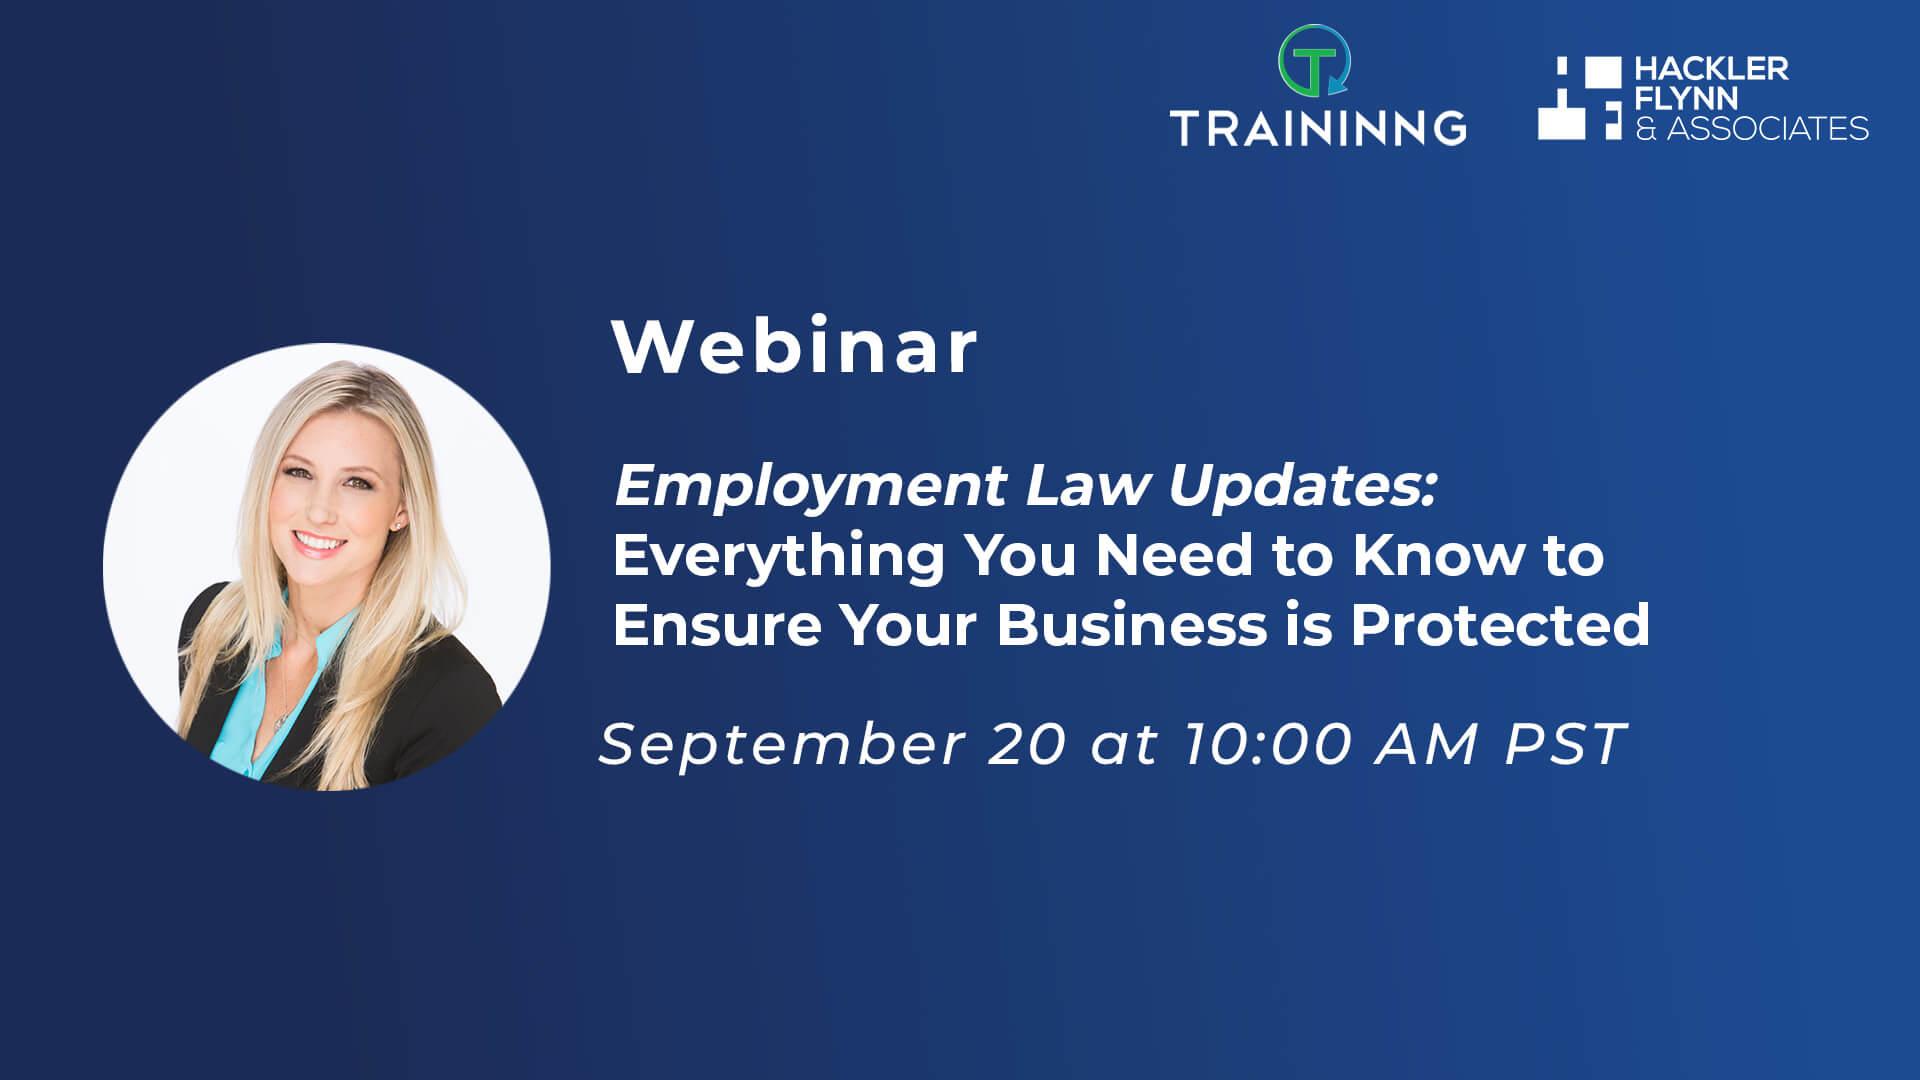 Traininng Webinar Graphic-Employment Law Updates